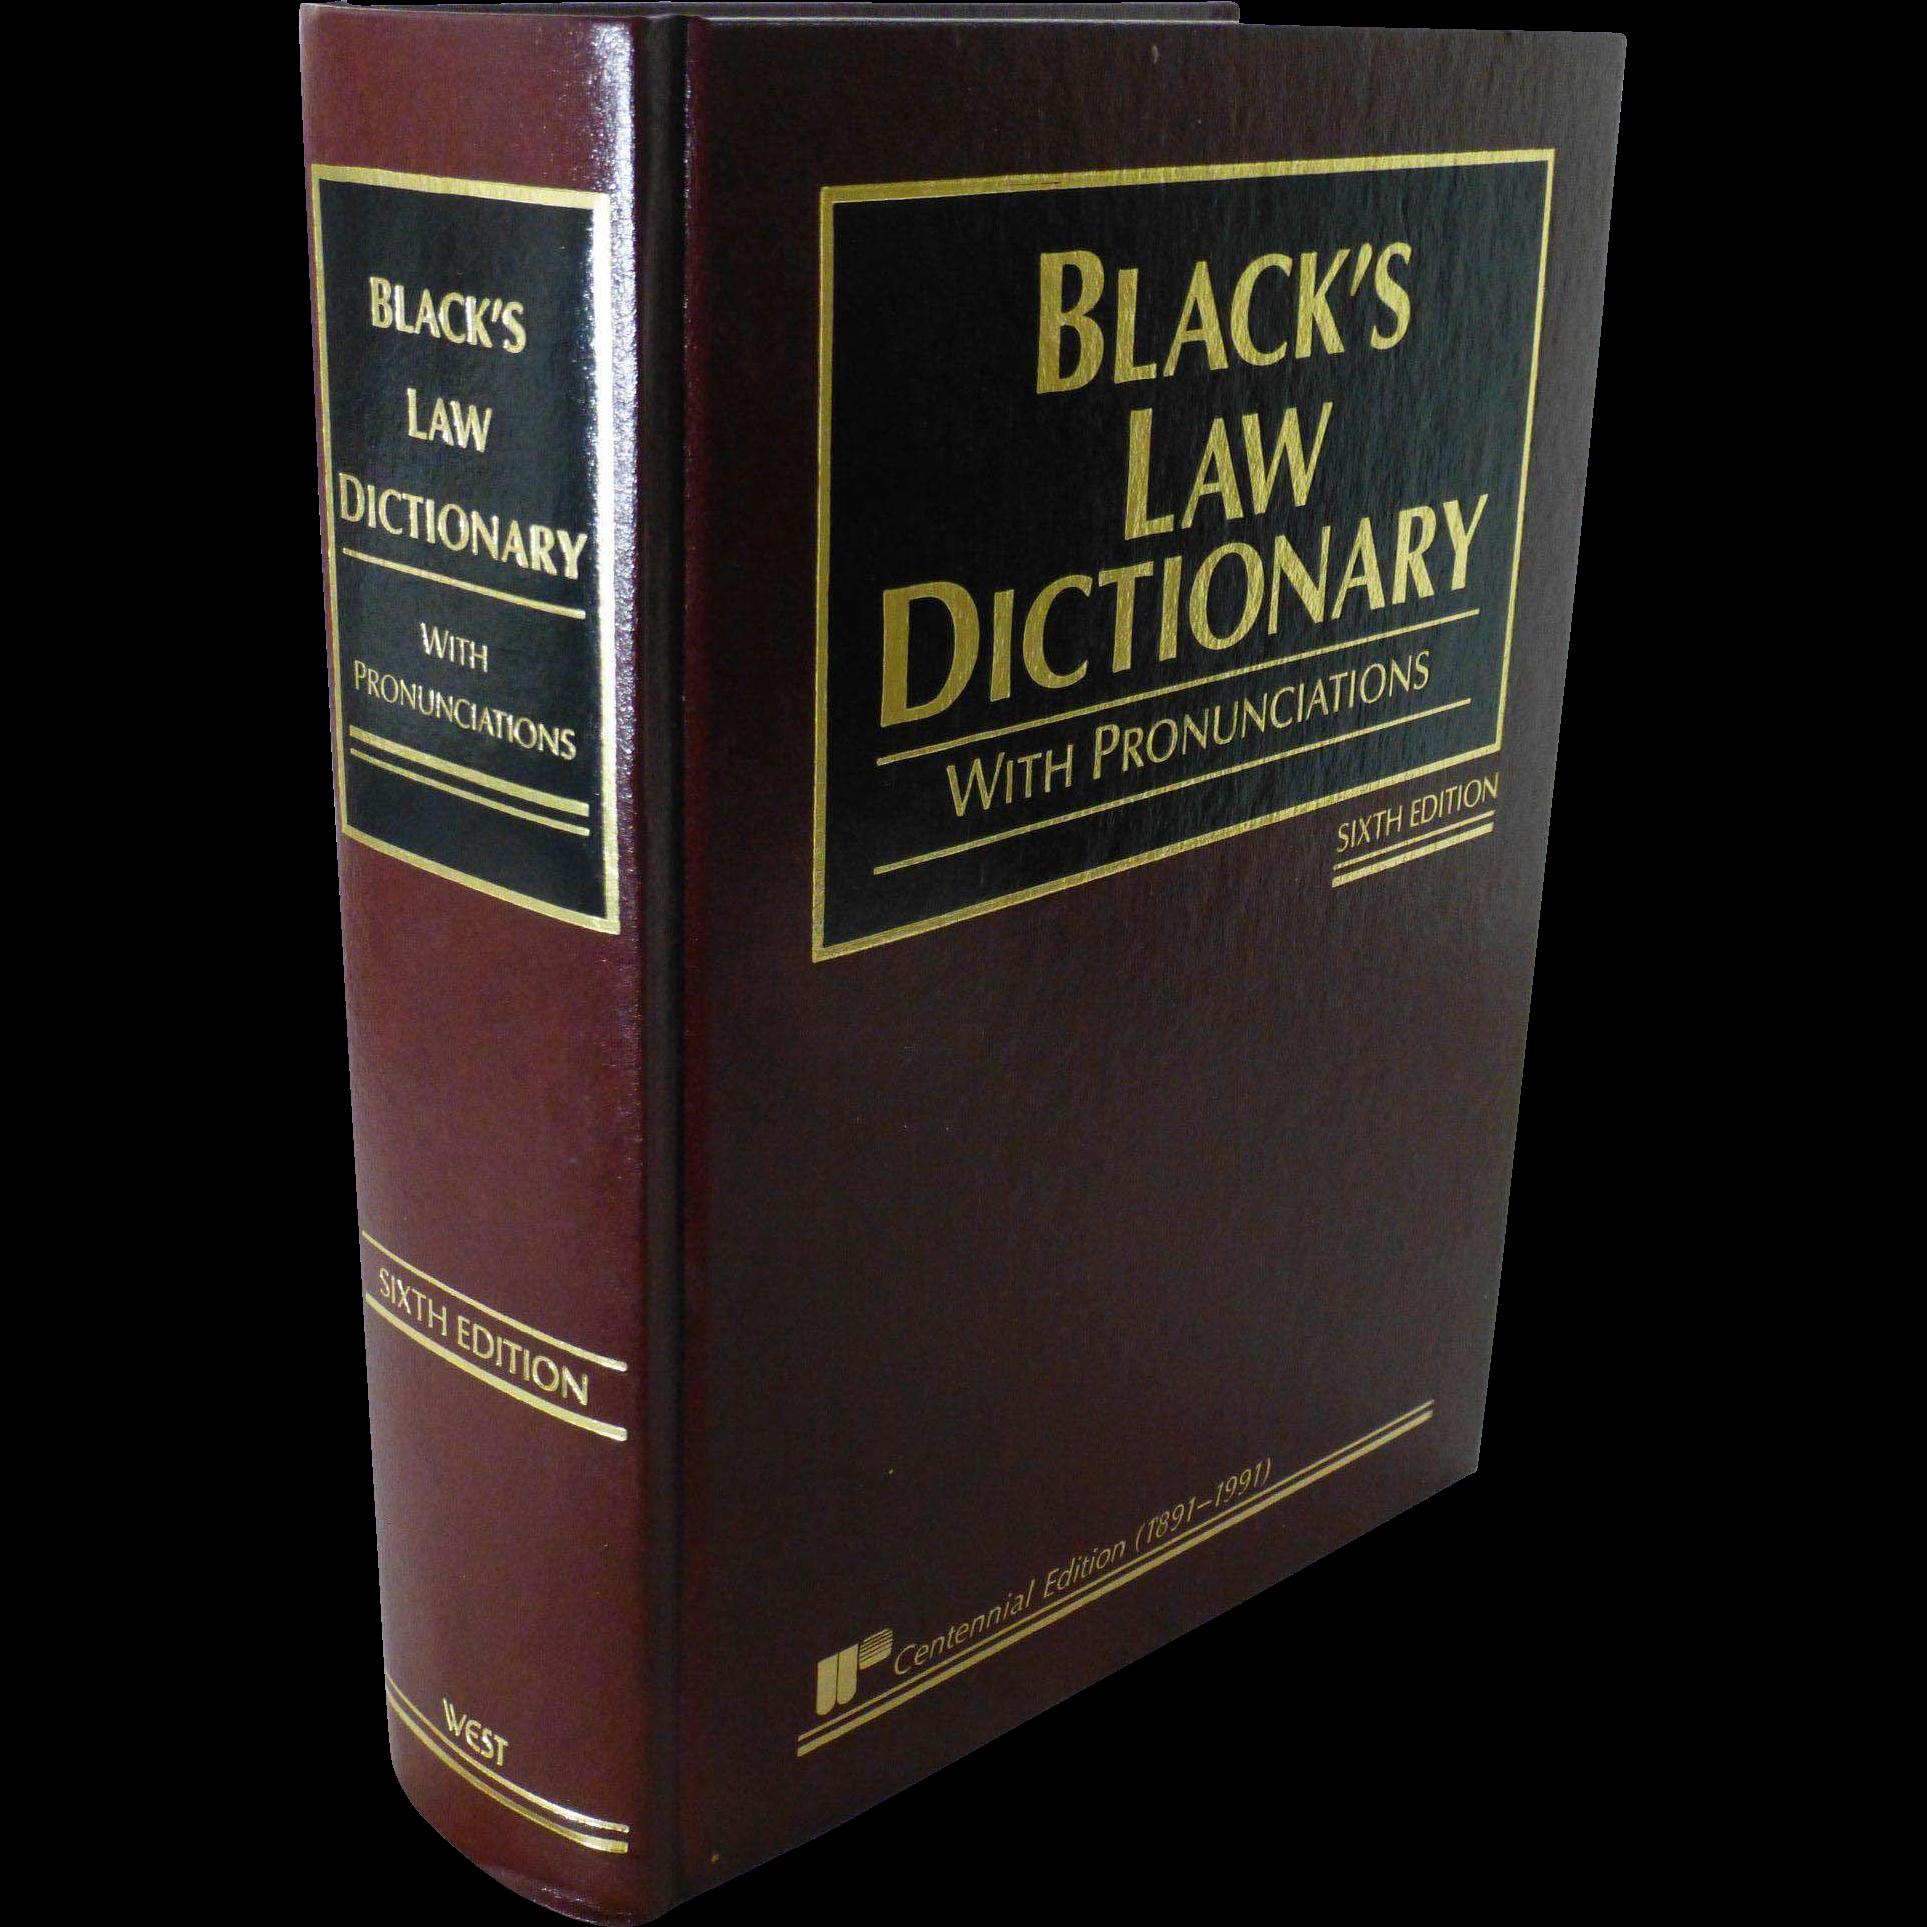 Blacks law dictionary pdf free download